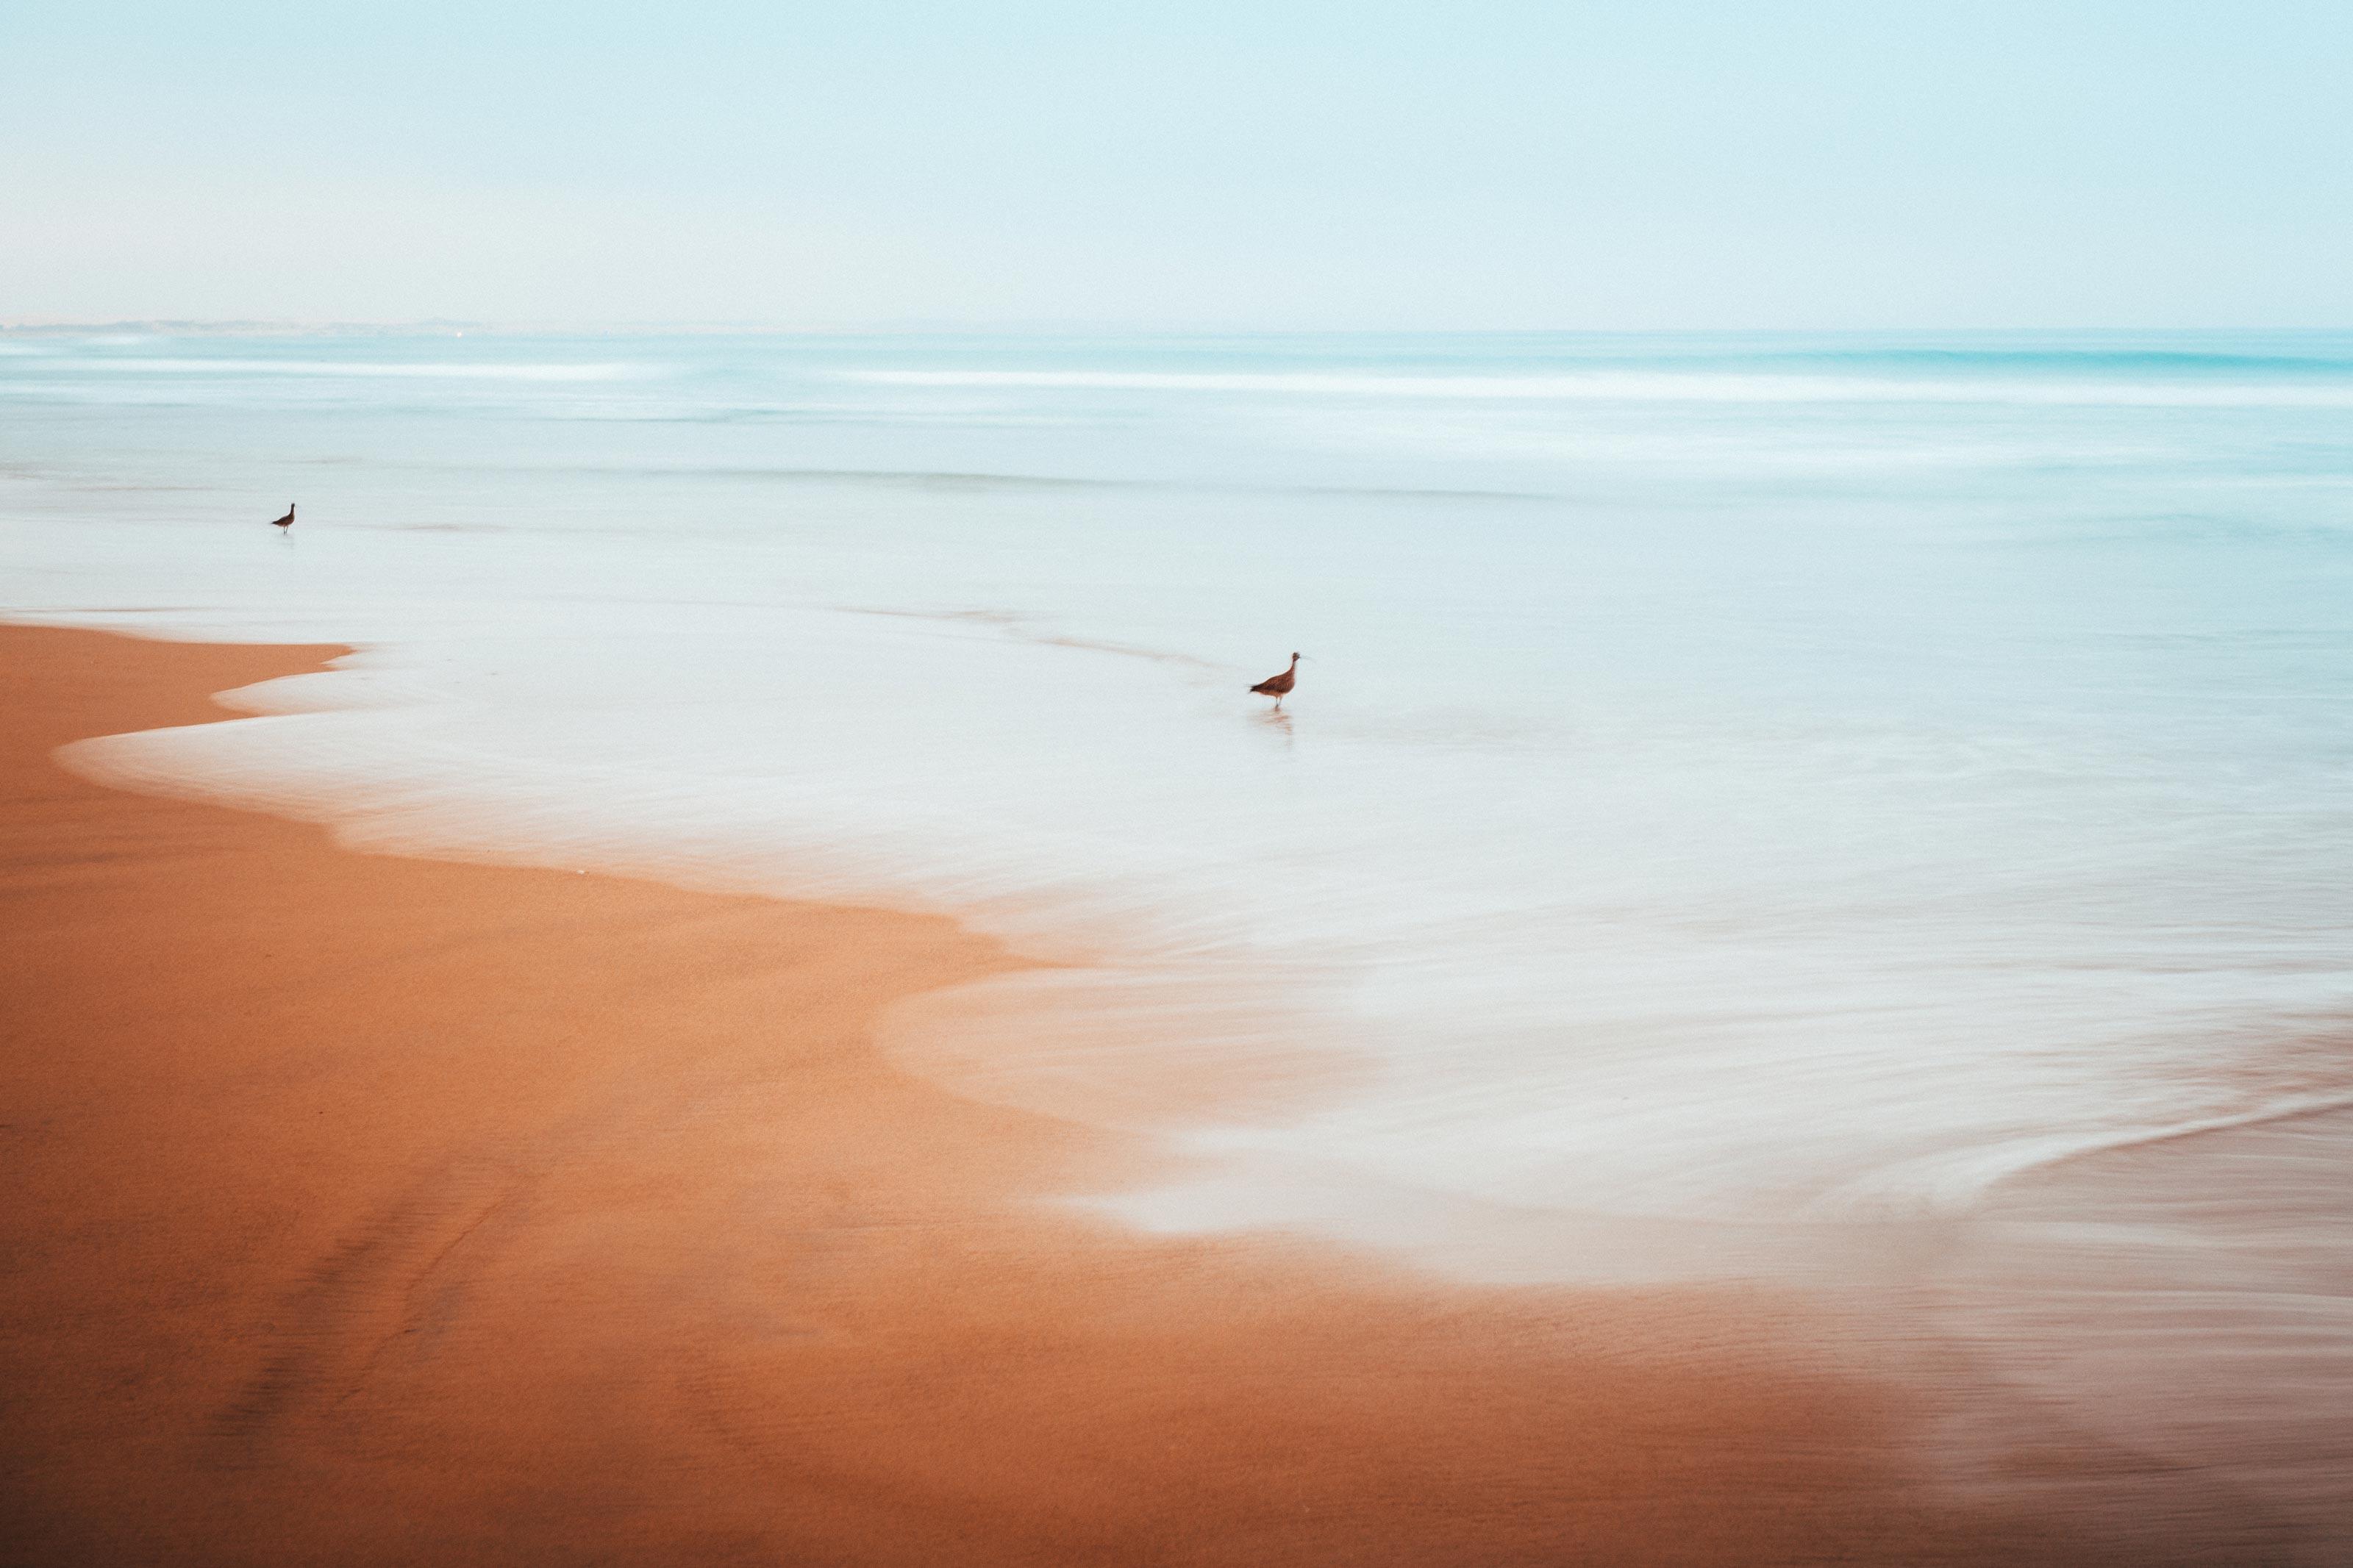 Landschaftsfotografie Wasser Bewegung